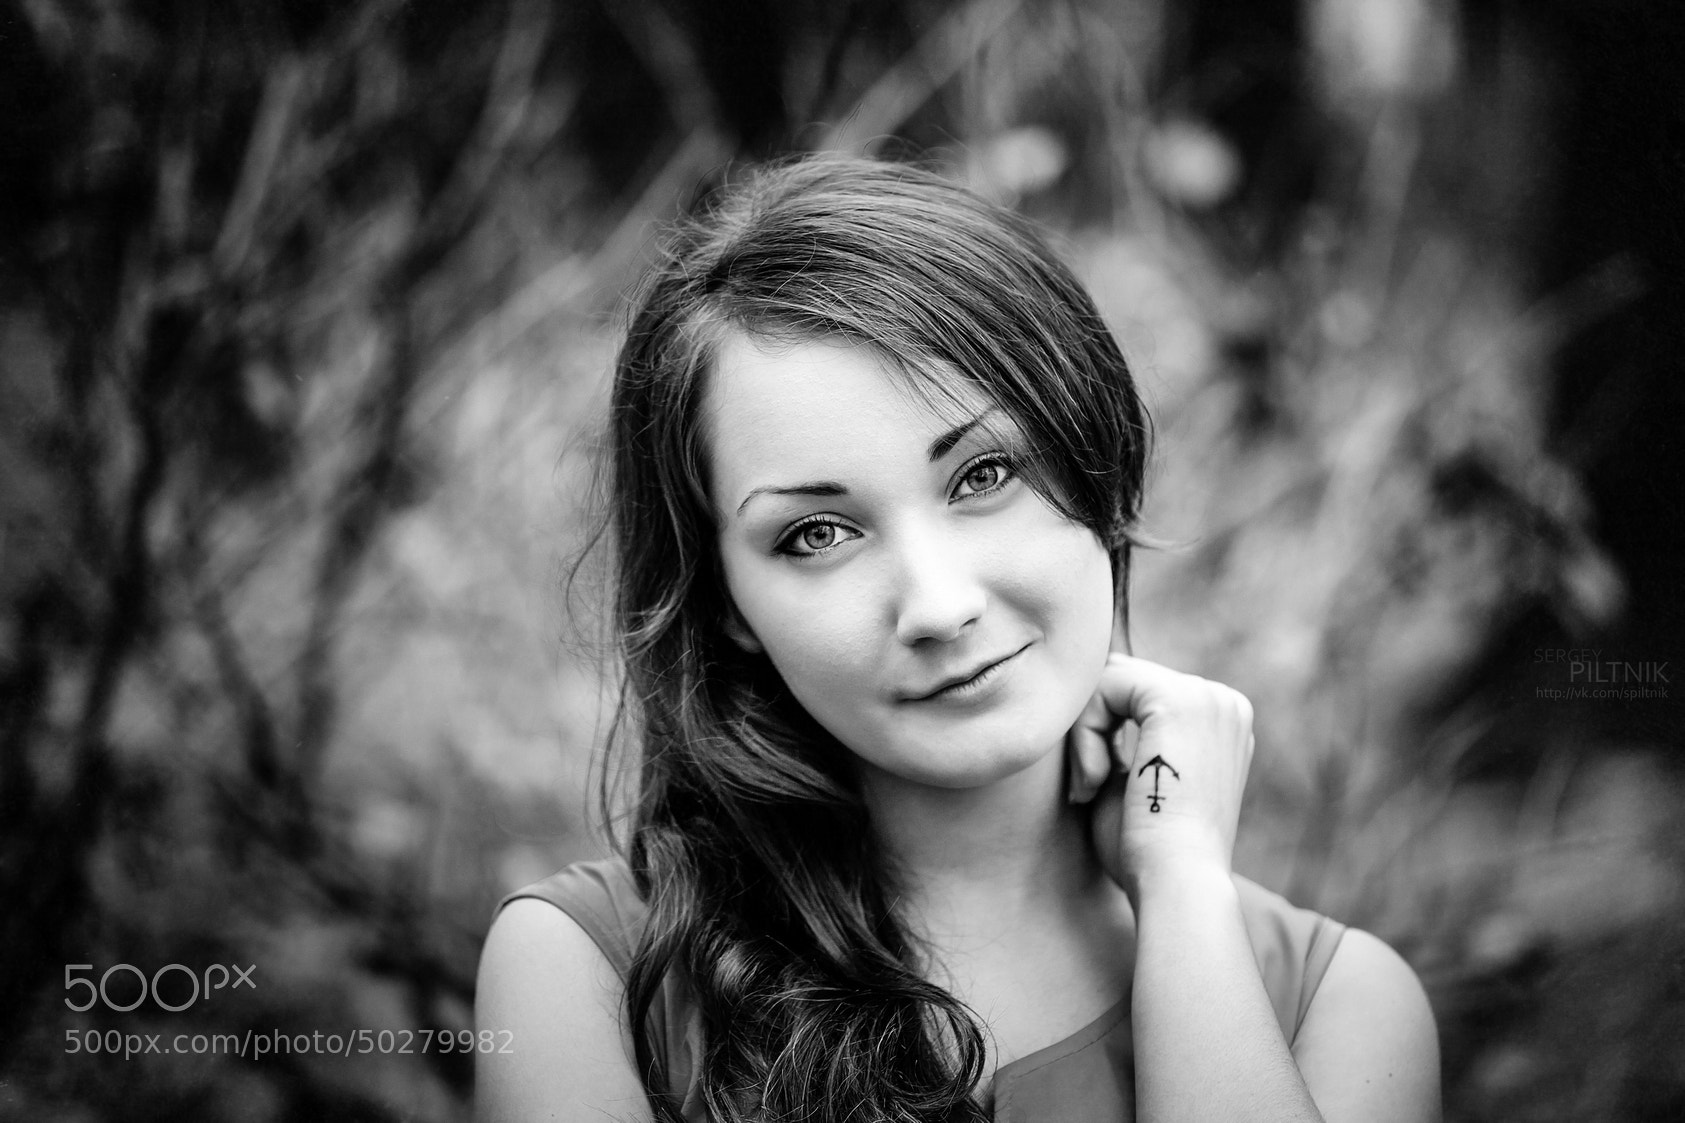 Photograph Alexandra by Serg  Piltnik (Пилтник) on 500px